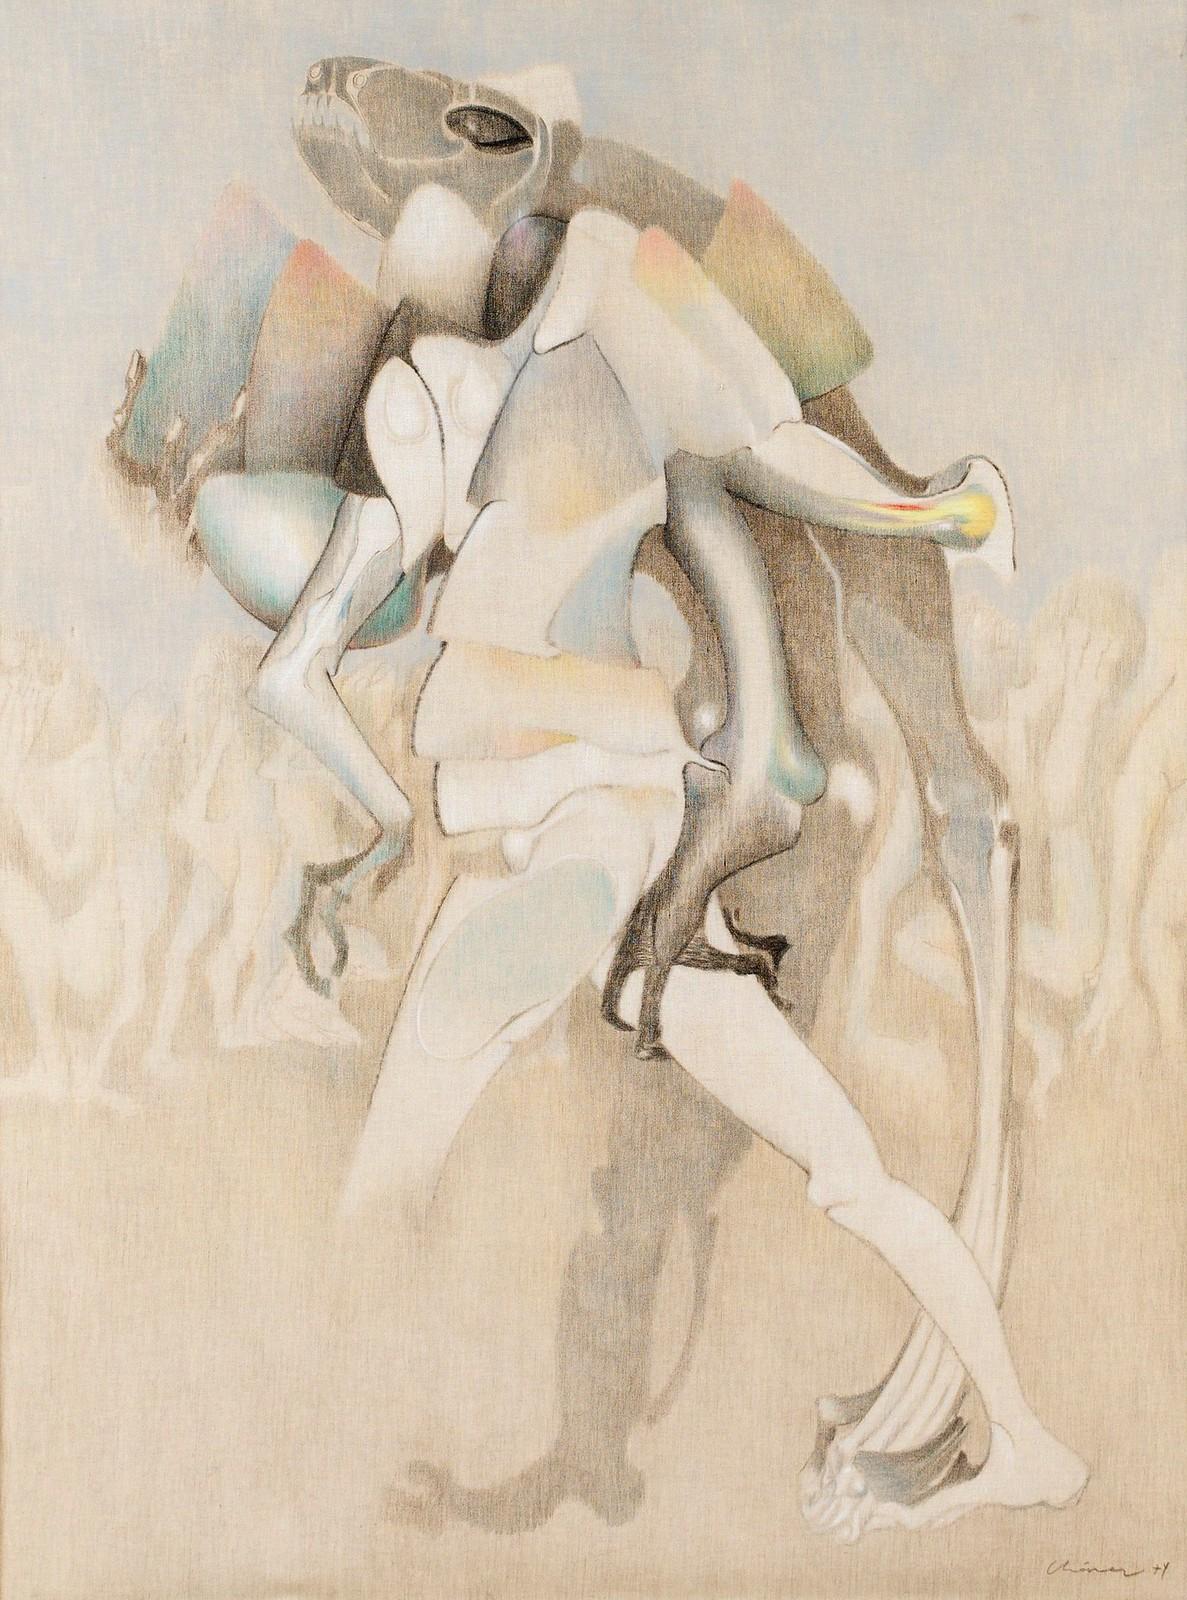 Gerardo Chavez Lopez - He Tilts Off His First Self, 1974